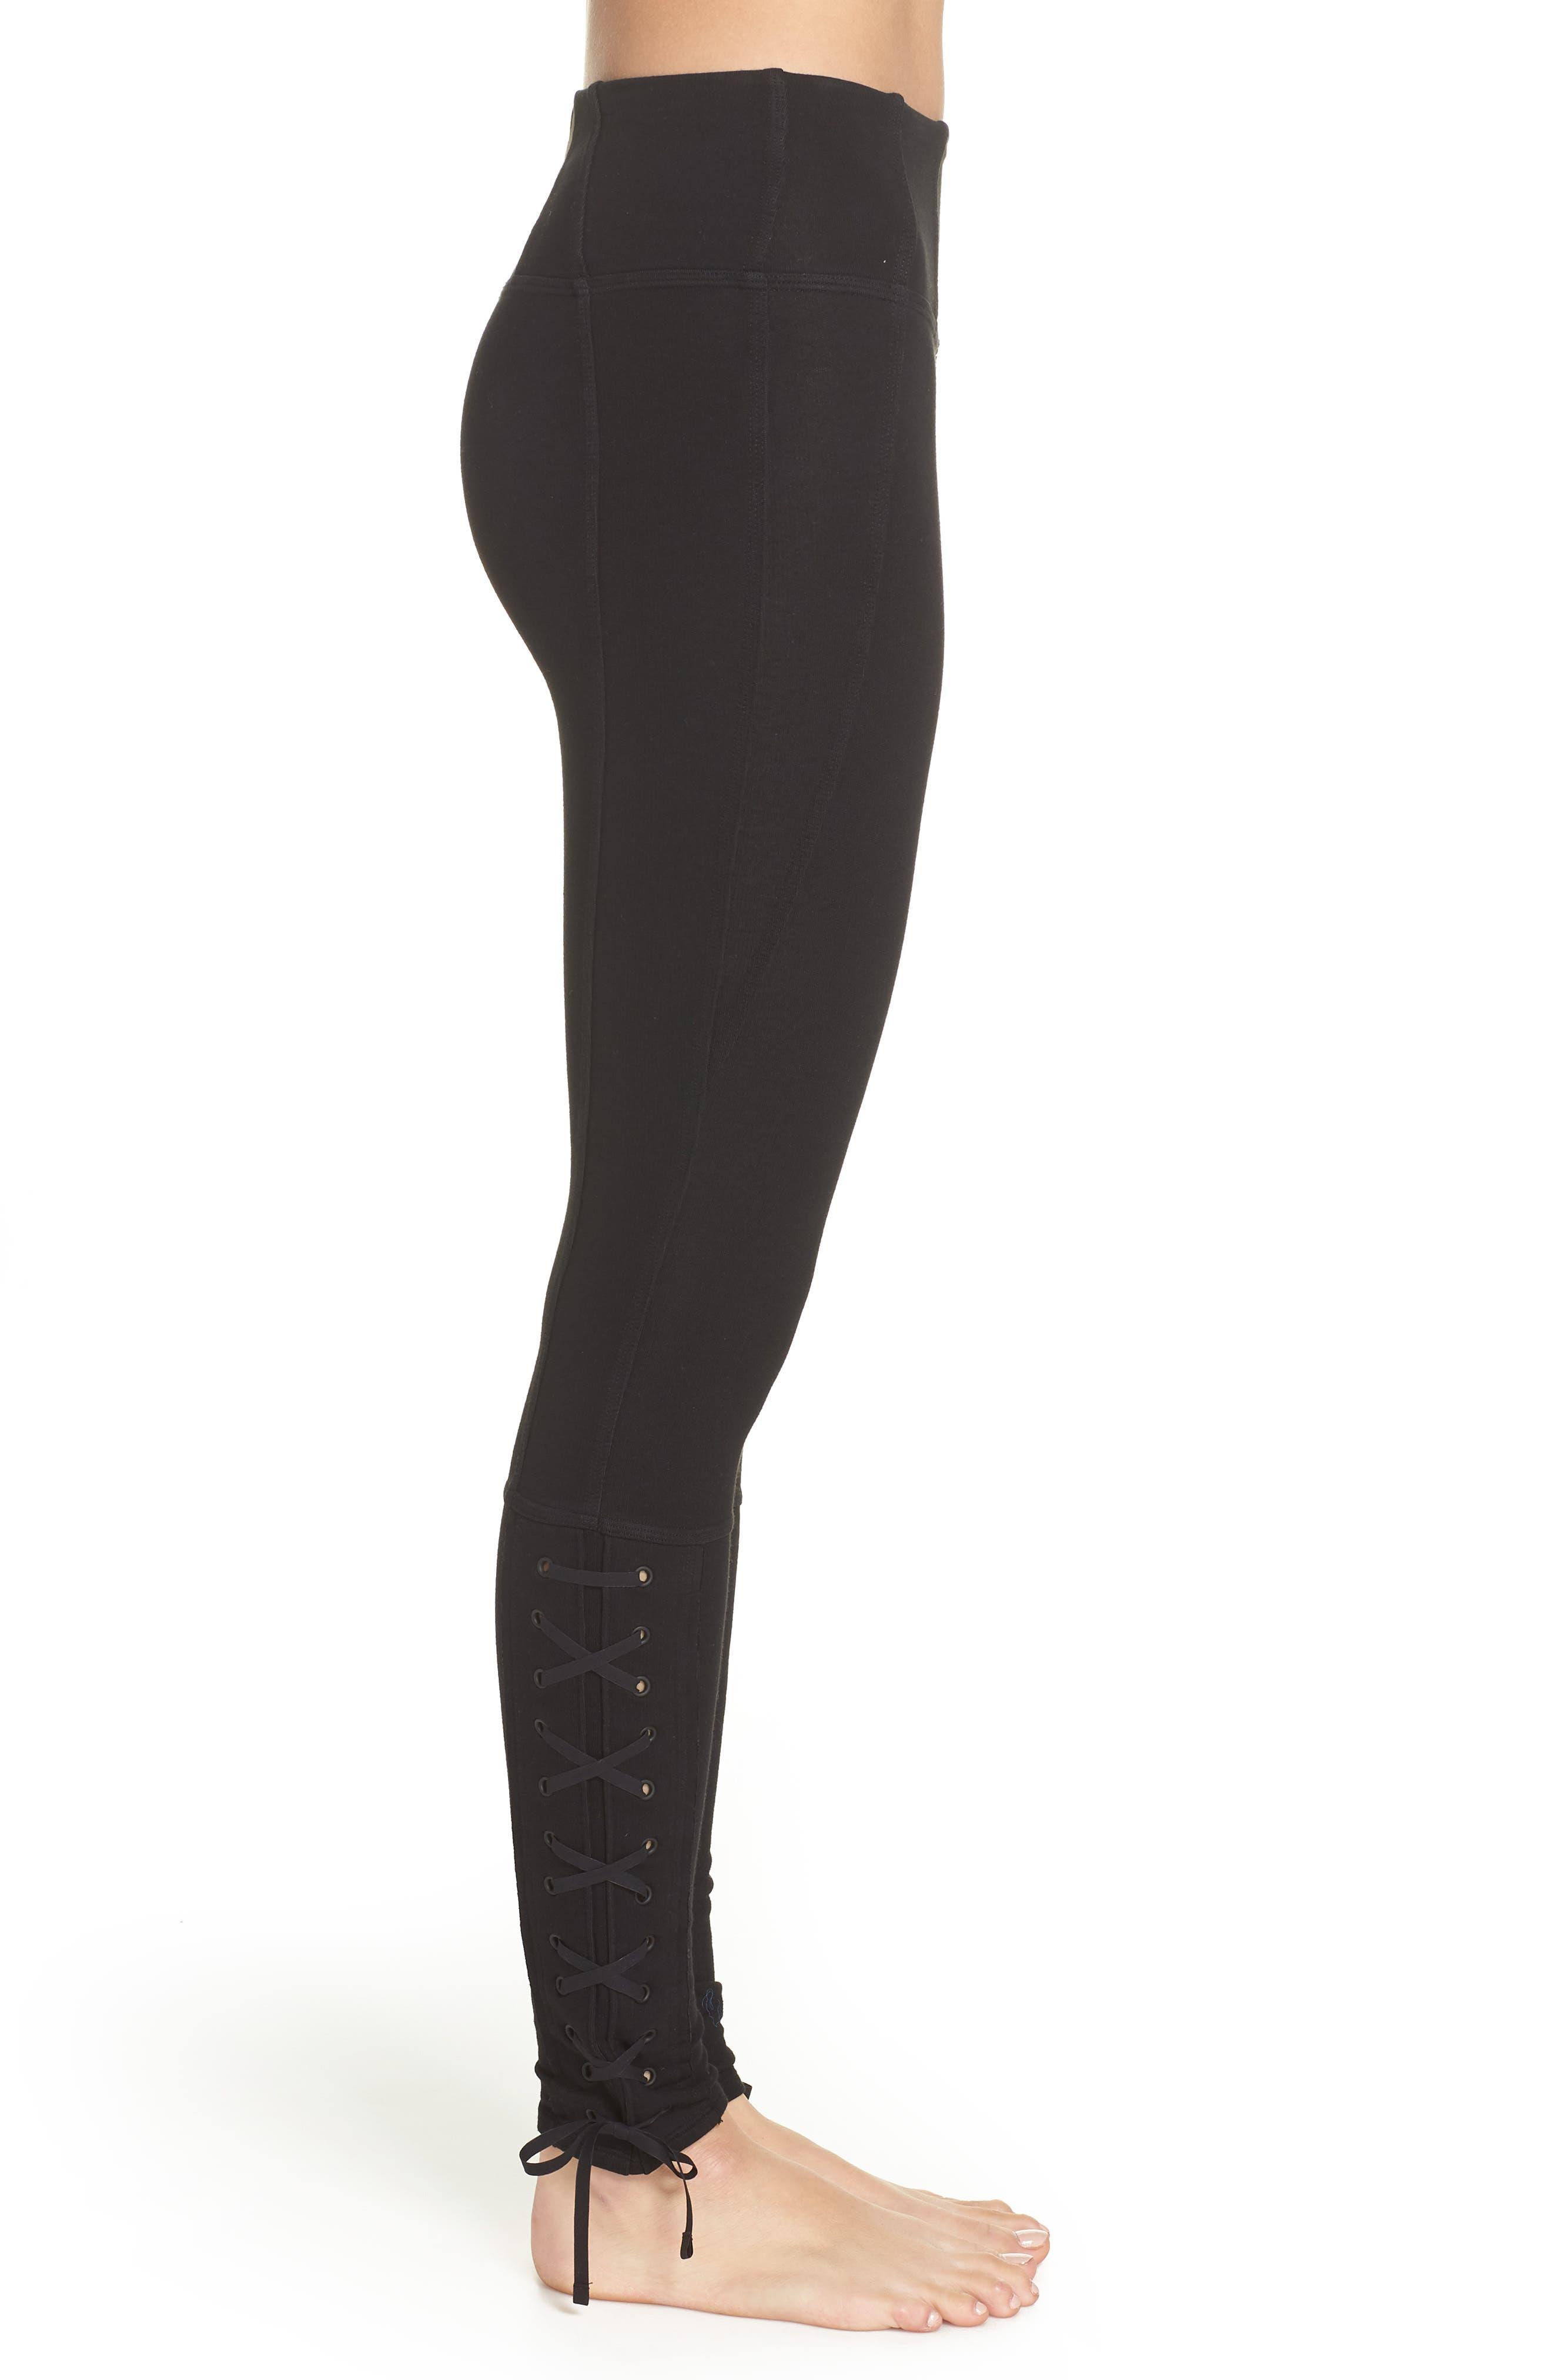 FP Movement Pixi Lace-Up Leggings,                             Alternate thumbnail 3, color,                             BLACK